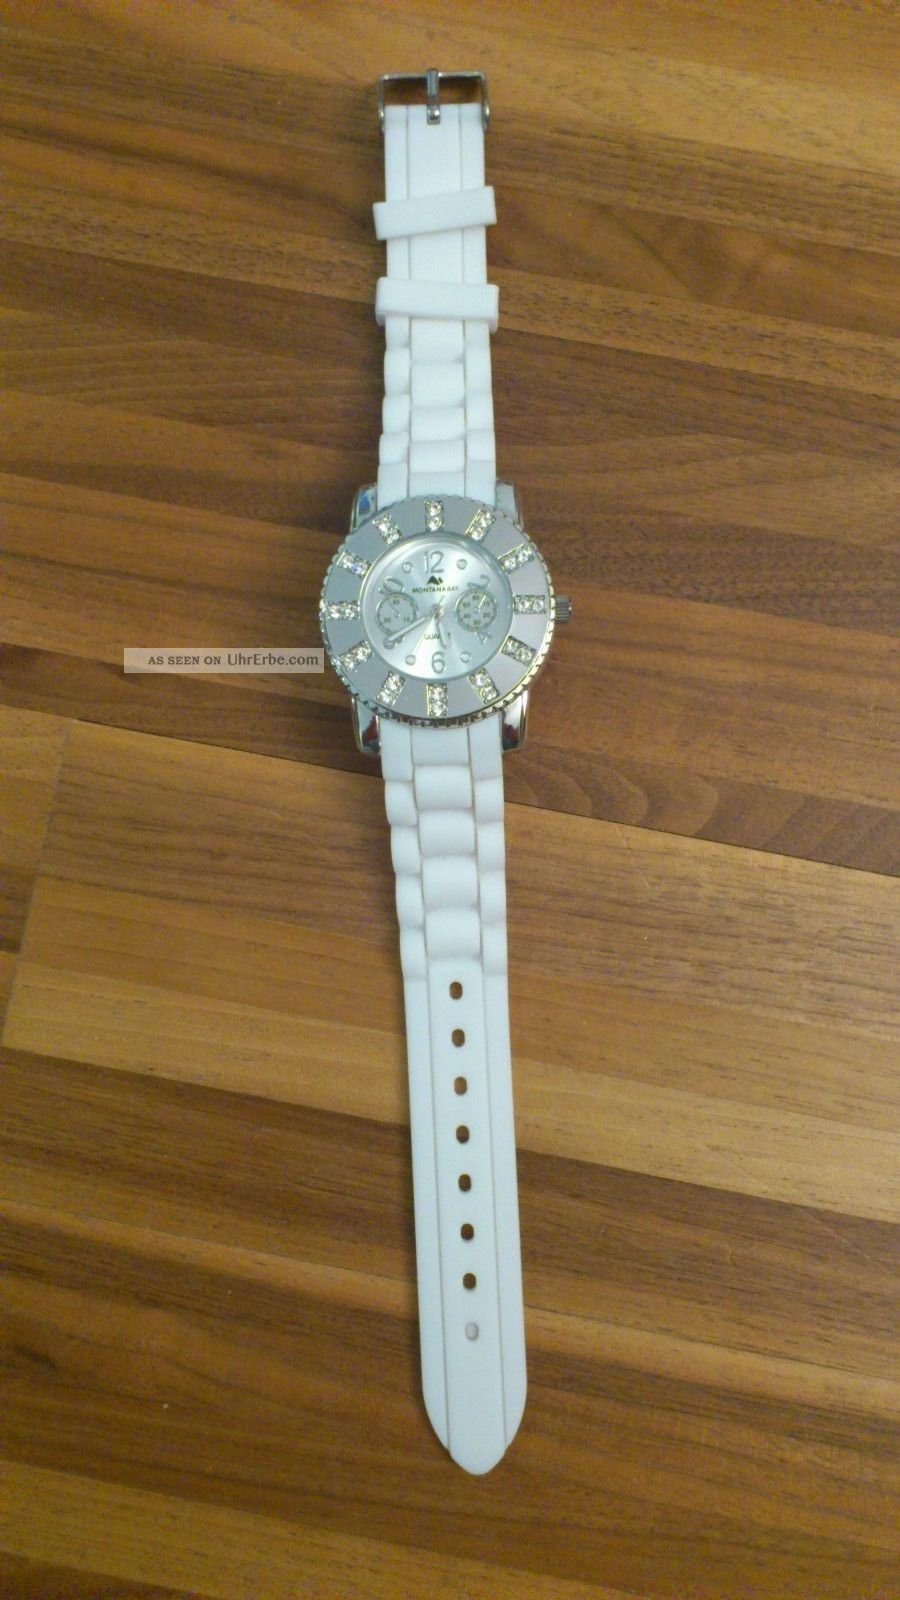 Damen - Uhr Made With Swarovski® Elements,  Weiß,  Silikonarmband,  Ziffernblatt Weiß Armbanduhren Bild